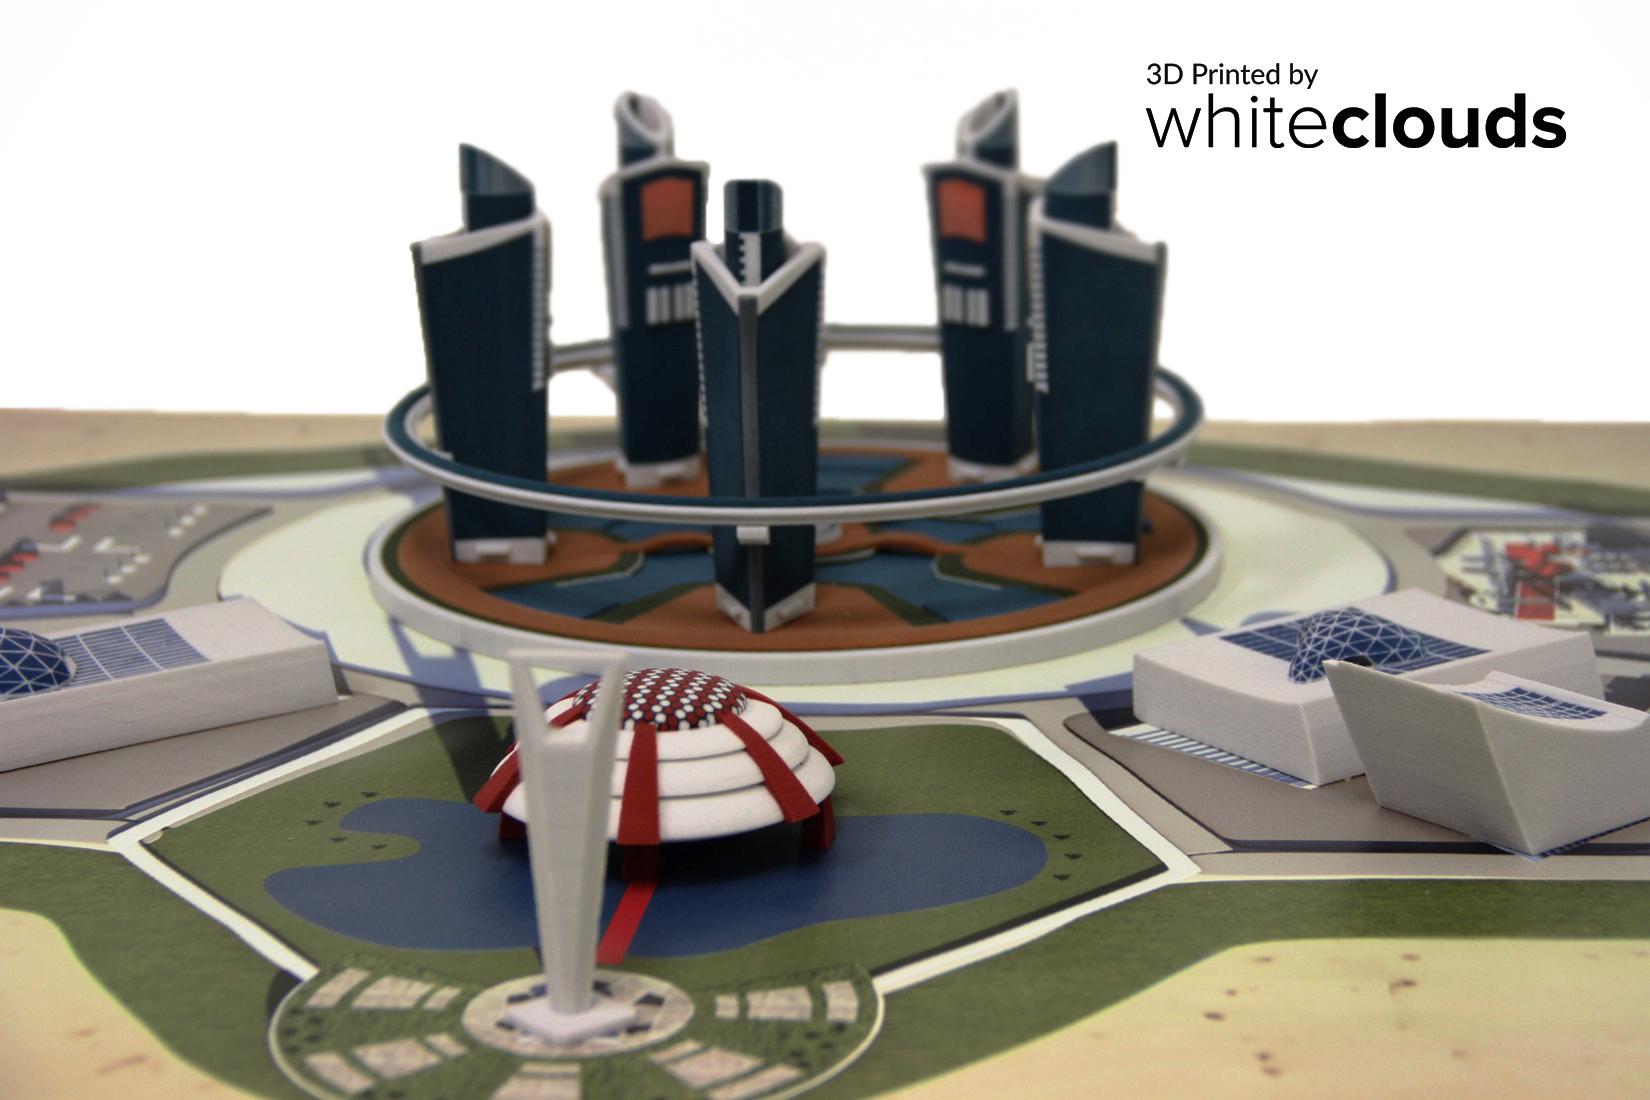 3D-Printed-WhiteClouds-Future-Building-Architectural-Dubai-Future-3.jpg